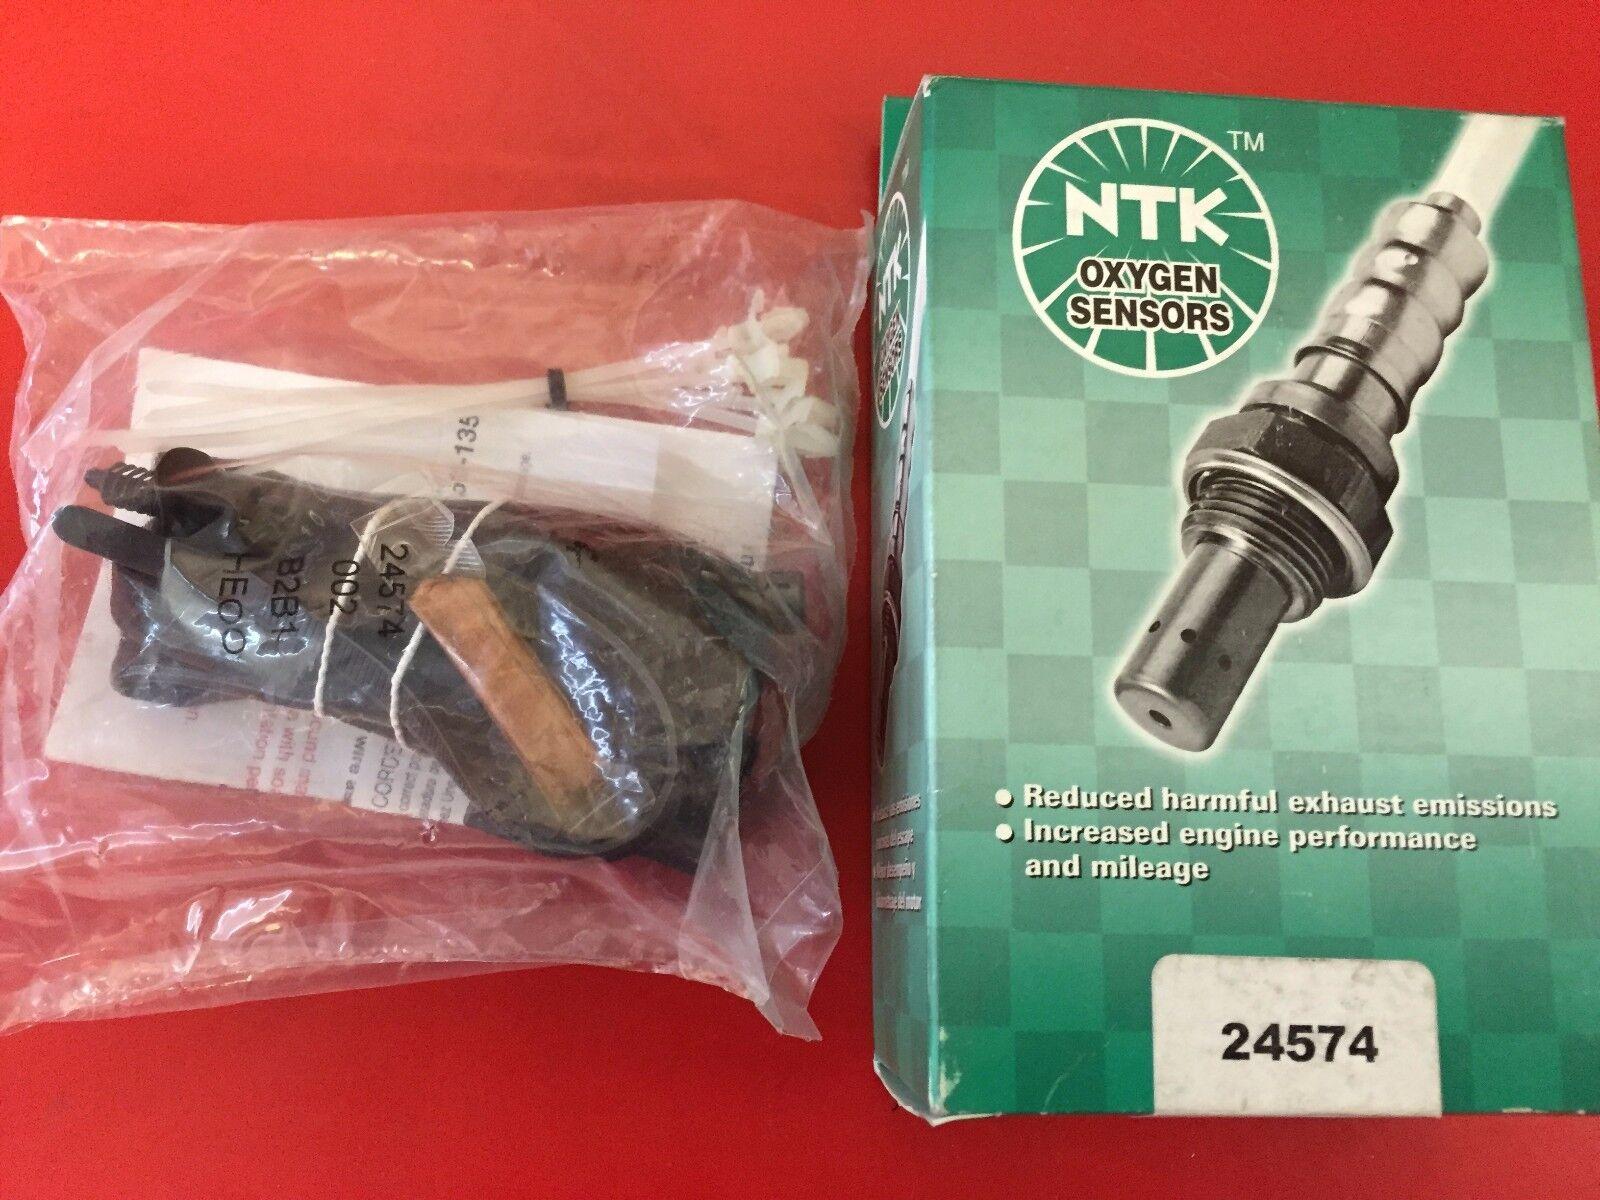 NEW GENUINE NTK NGK 24574 Oxygen Sensor fits NISSAN AND INFINITI MADE IN JAPAN